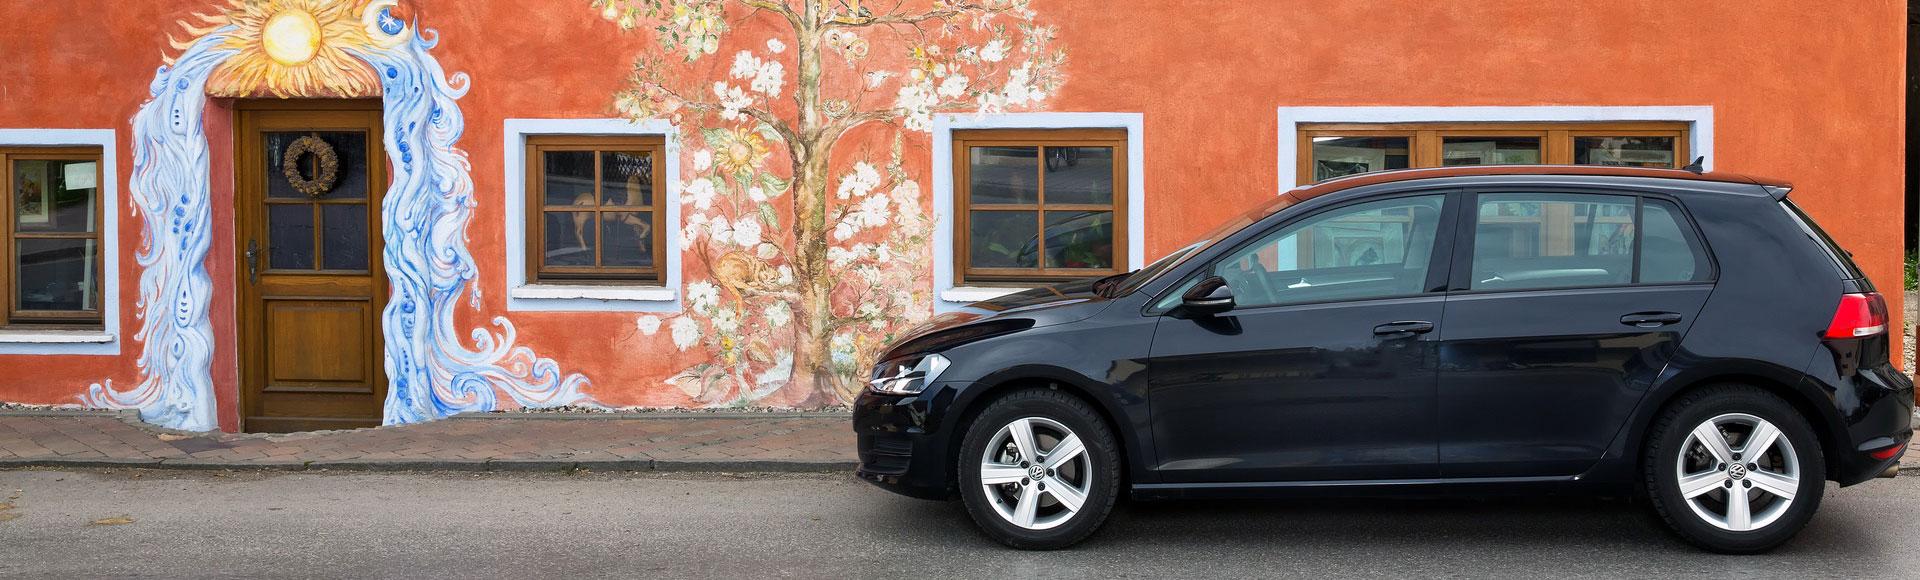 VW Golf 2013 30643